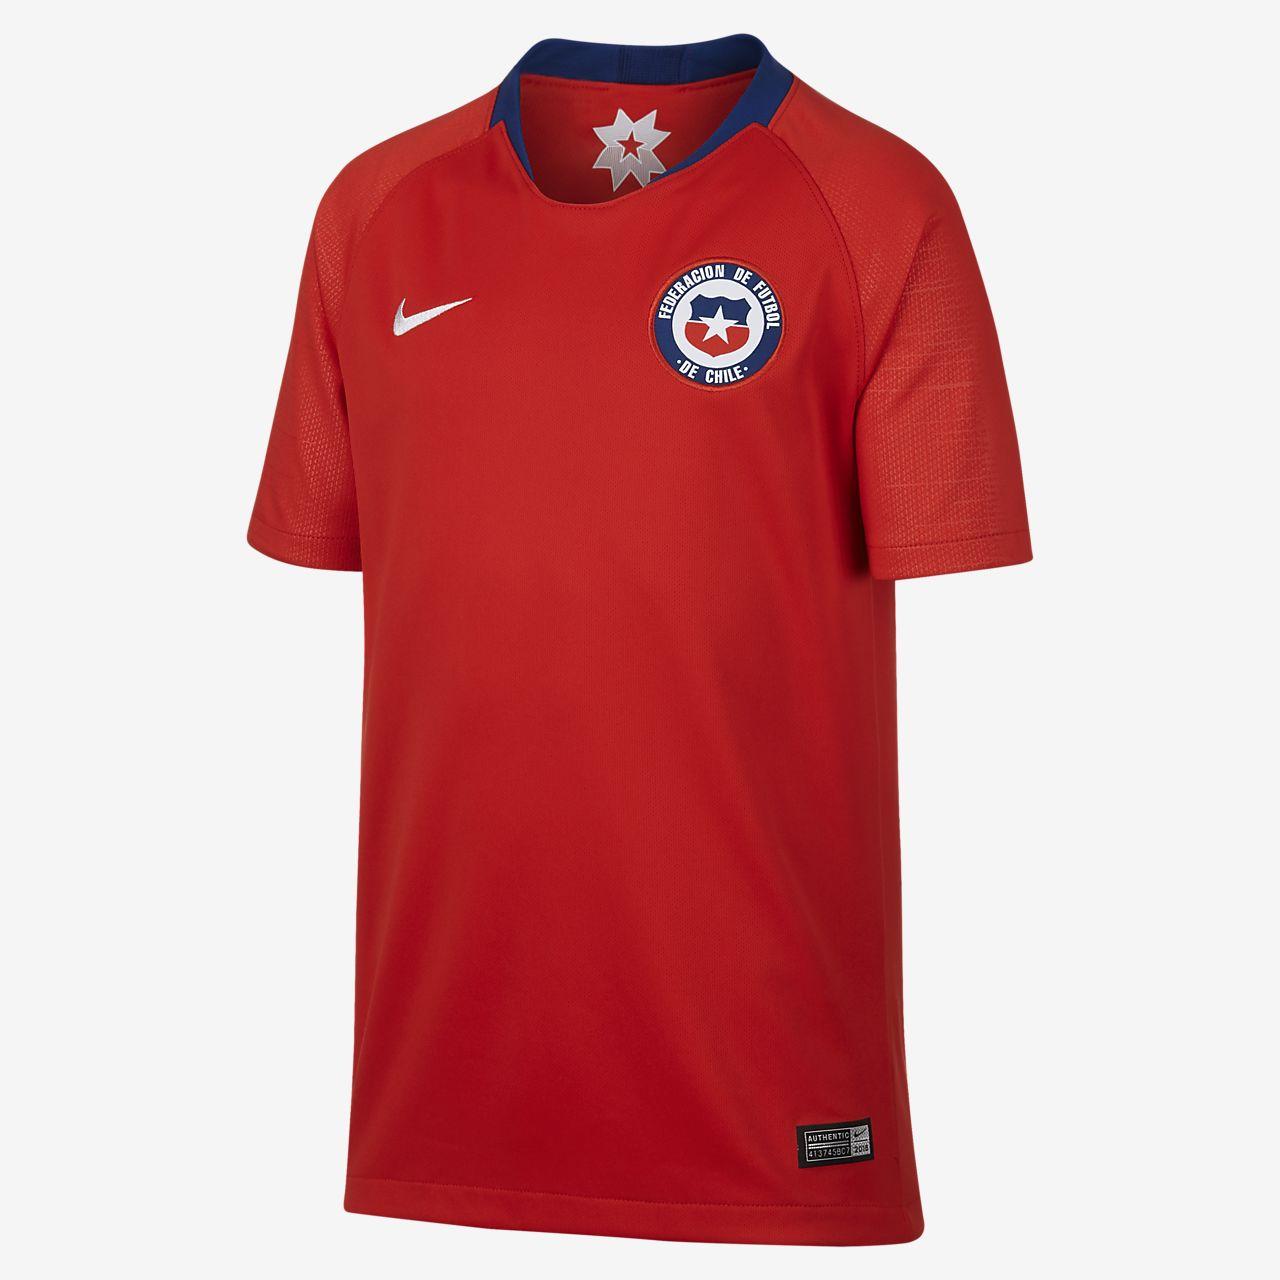 2018 Chile Stadium Home Fußballtrikot für ältere Kinder